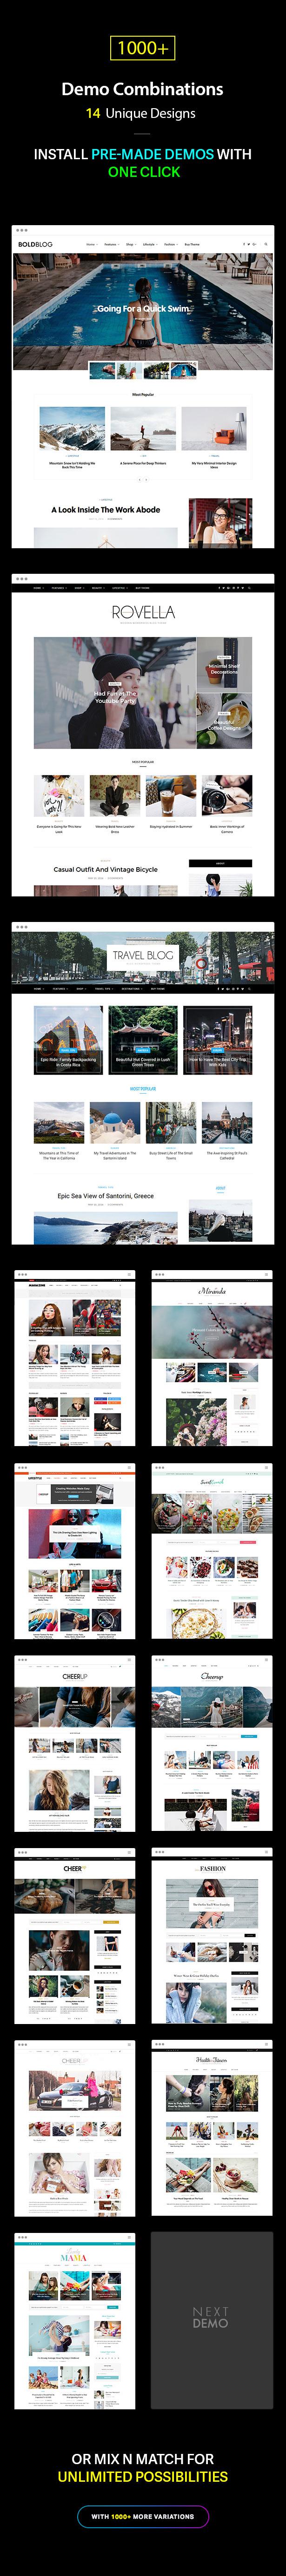 Multiple Blog and Magazine Layouts, 13+ Unique Designs